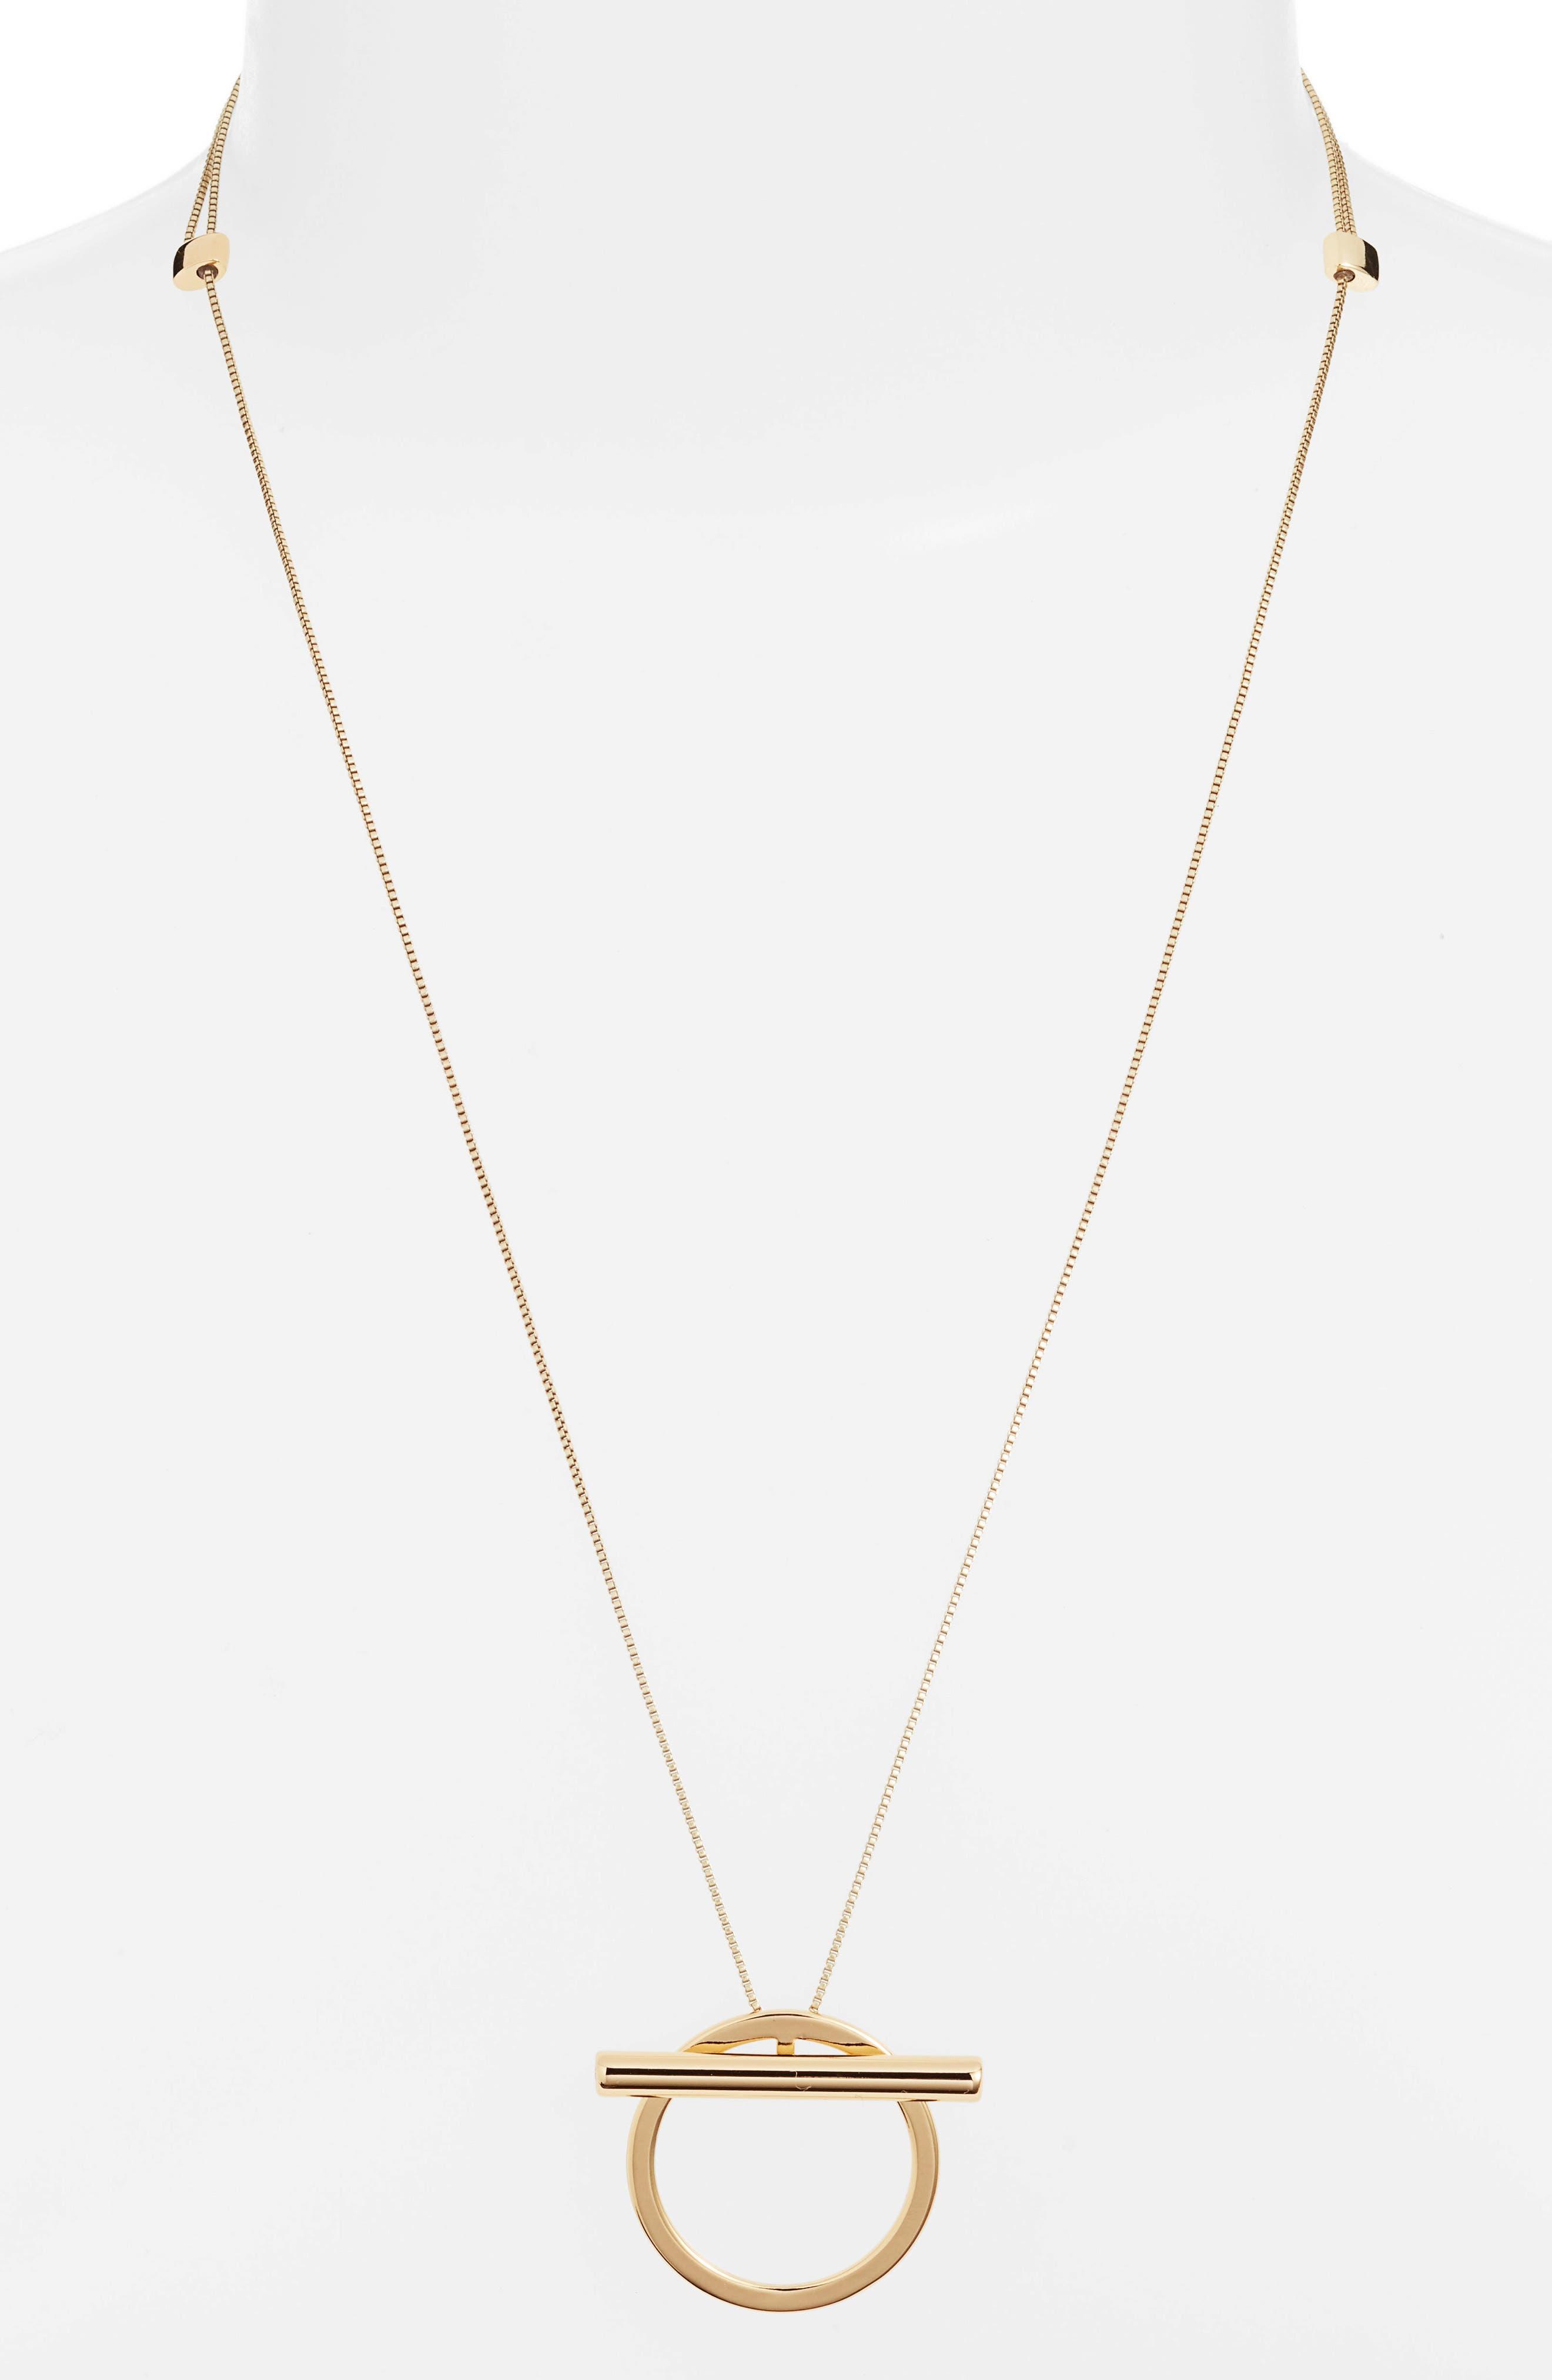 JENNY BIRD Trust Pendant Necklace in Gold